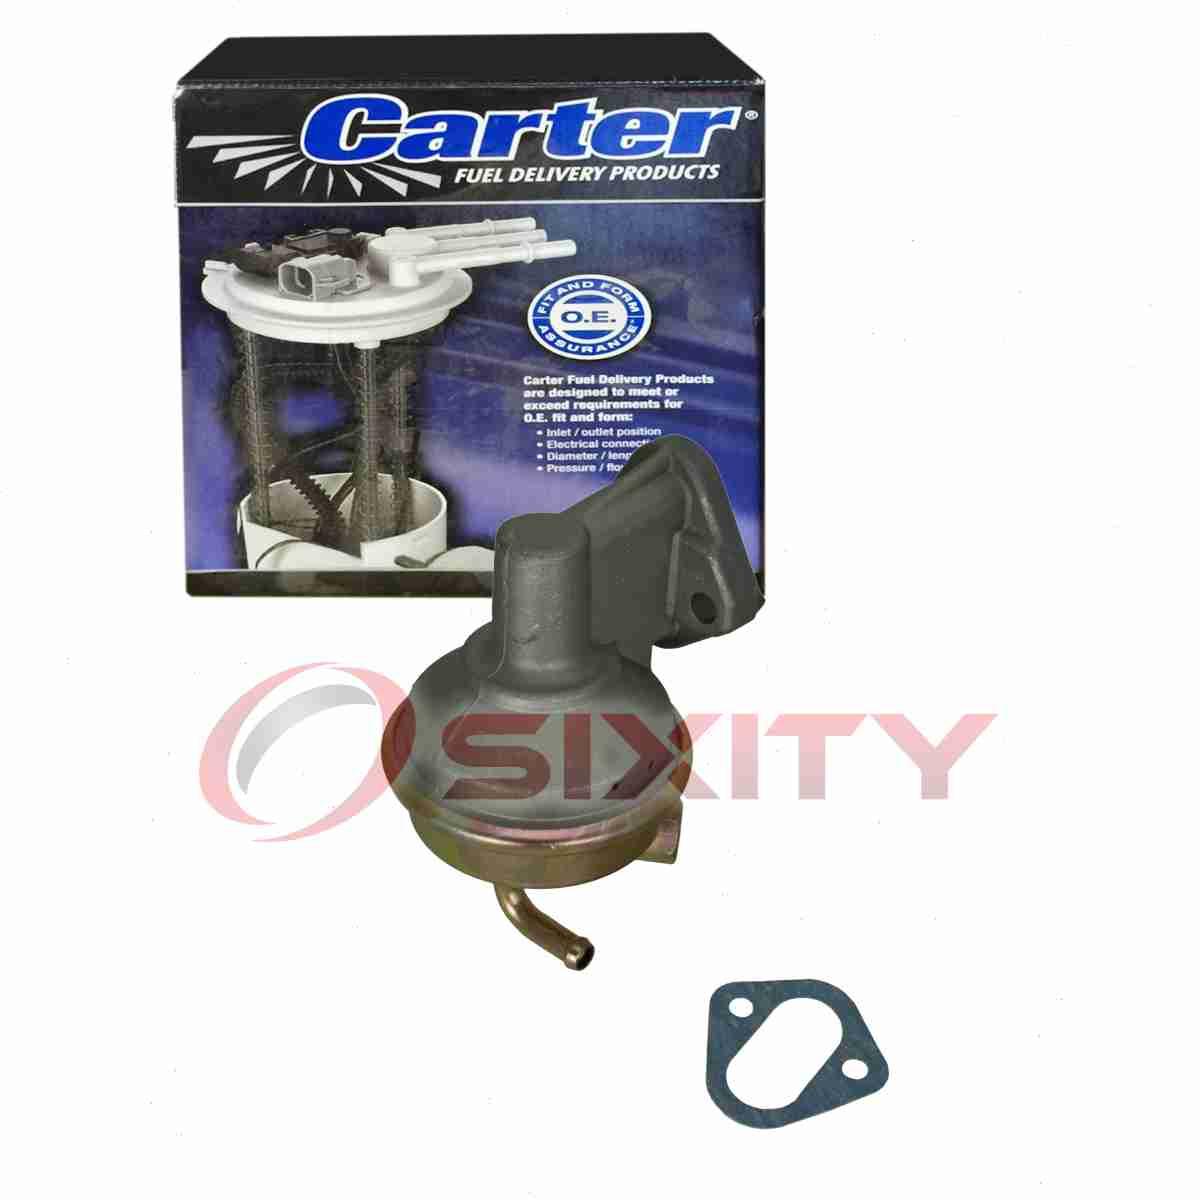 Carter Fuel Pump for 1982-1989 Chevrolet P20 6.2L V8 Mechanical Gas Diesel oh